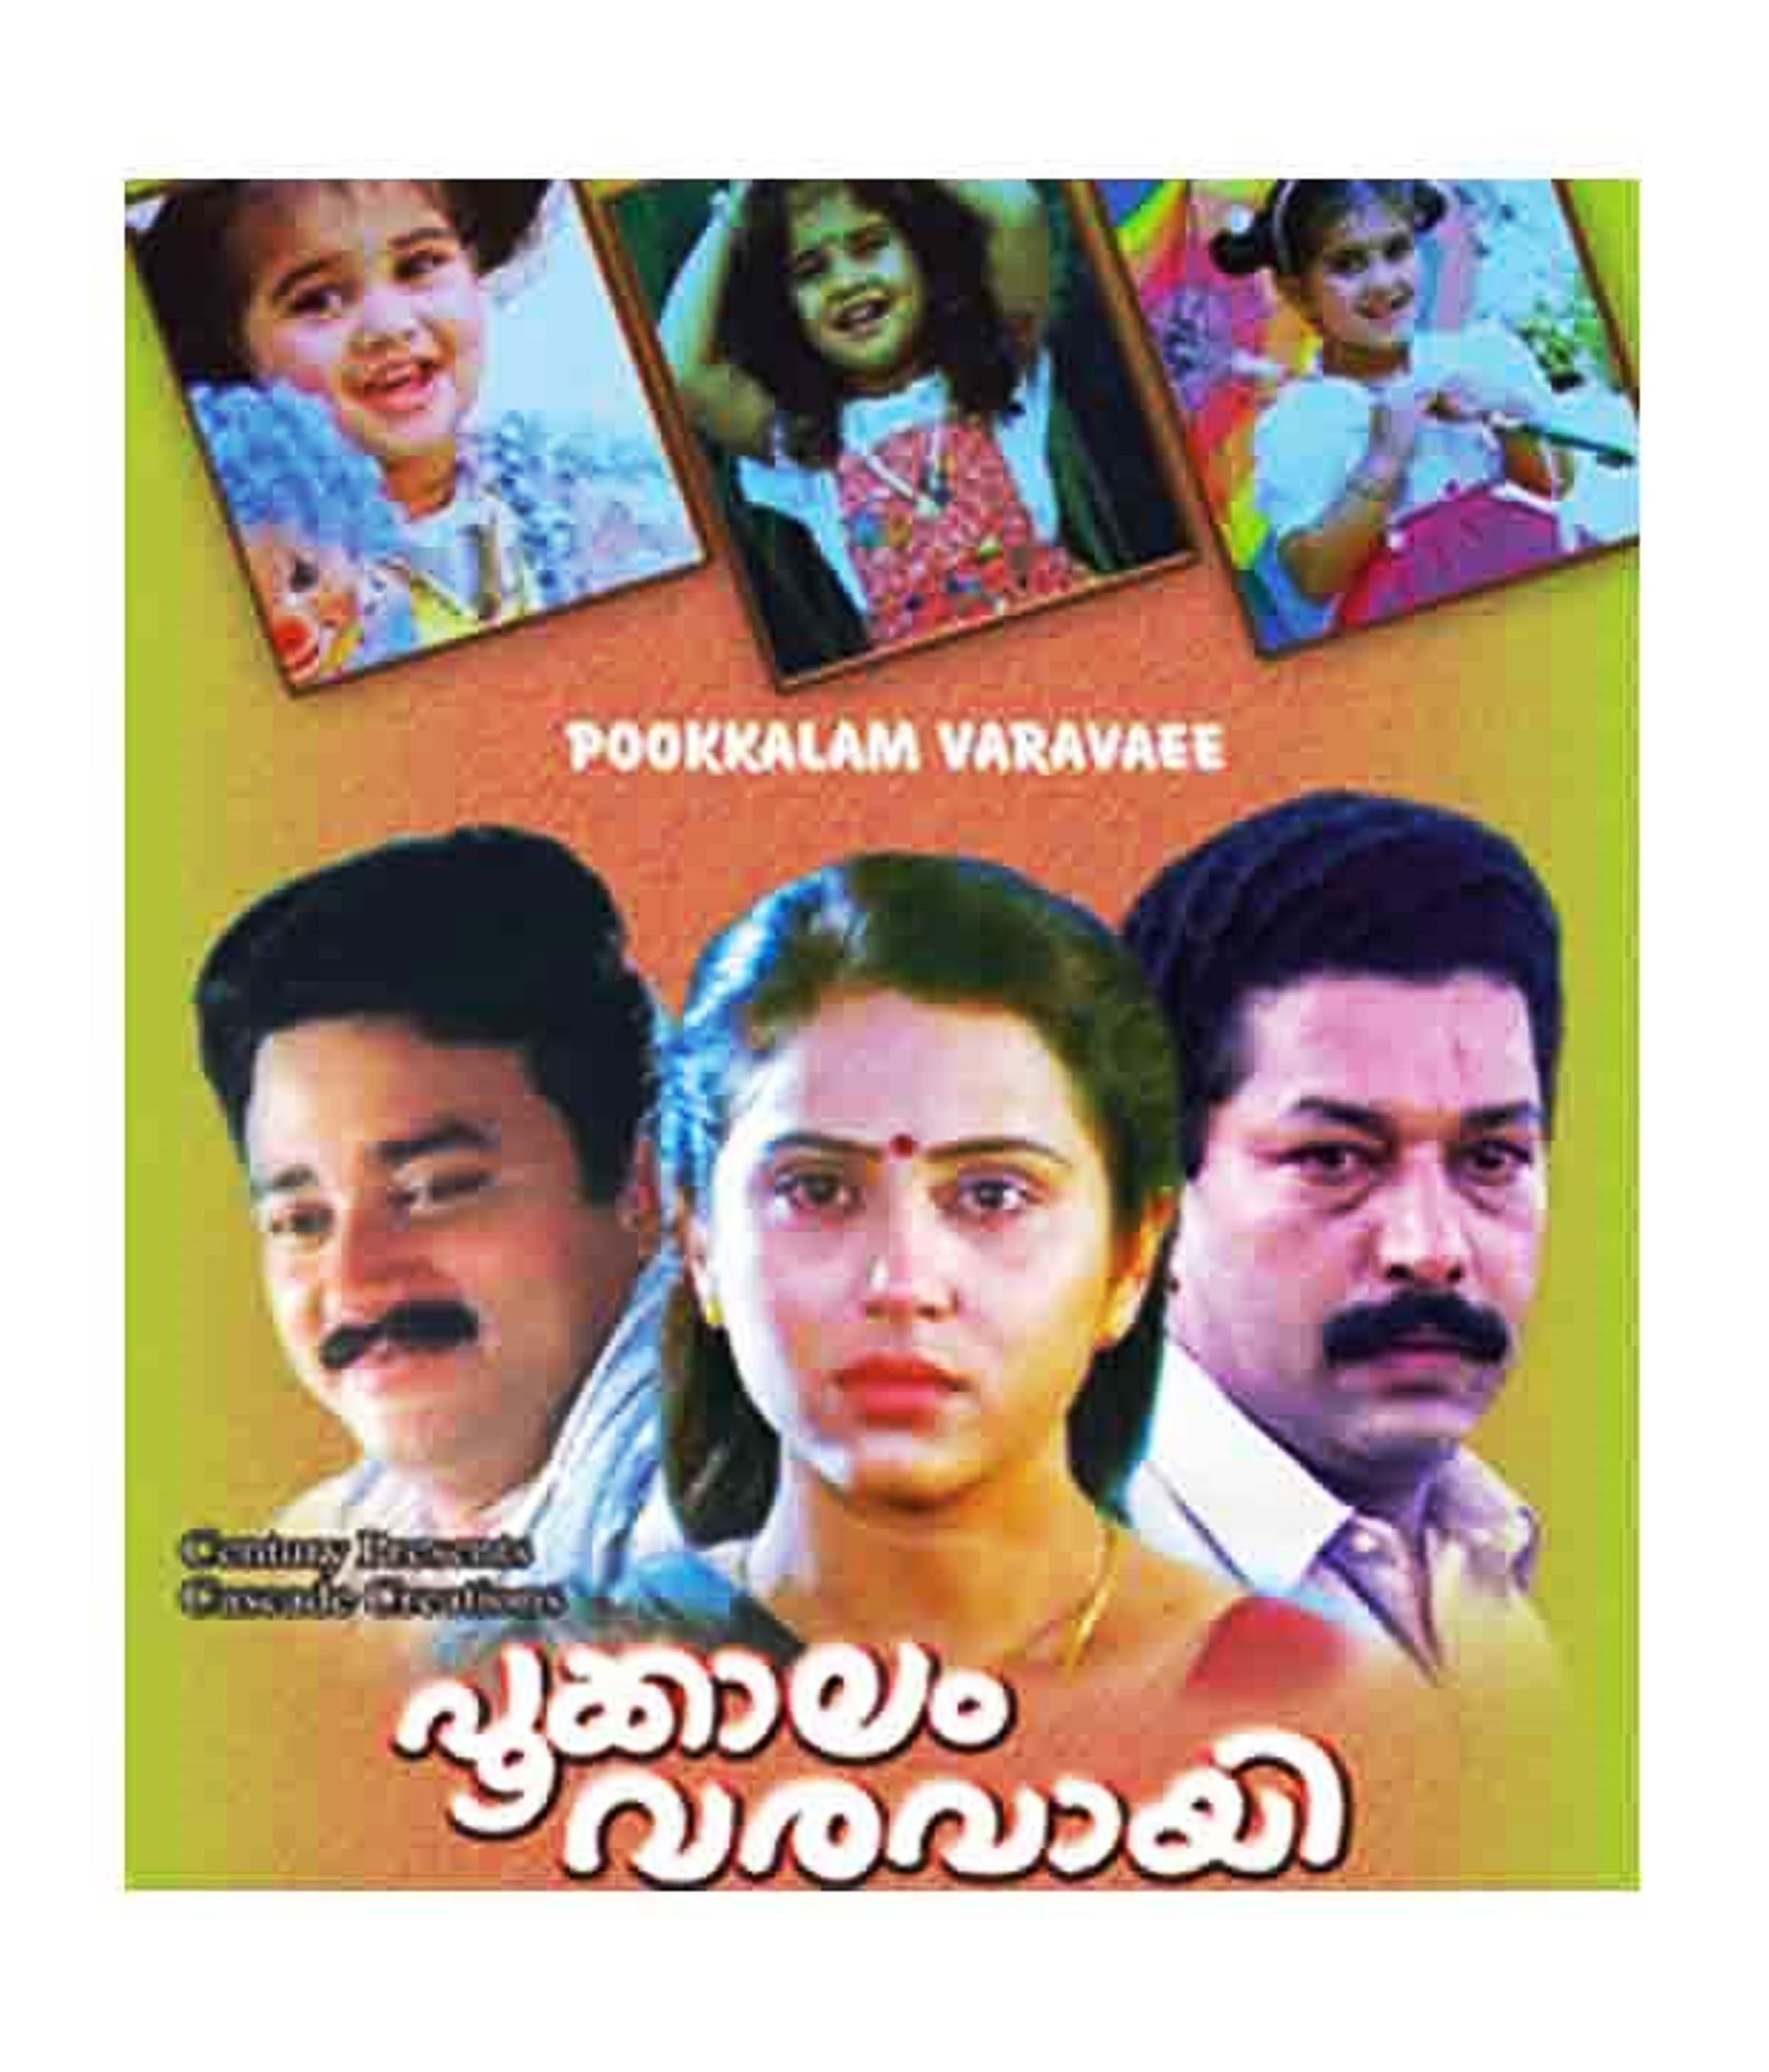 Pookkalam Varavayi Movie Poster